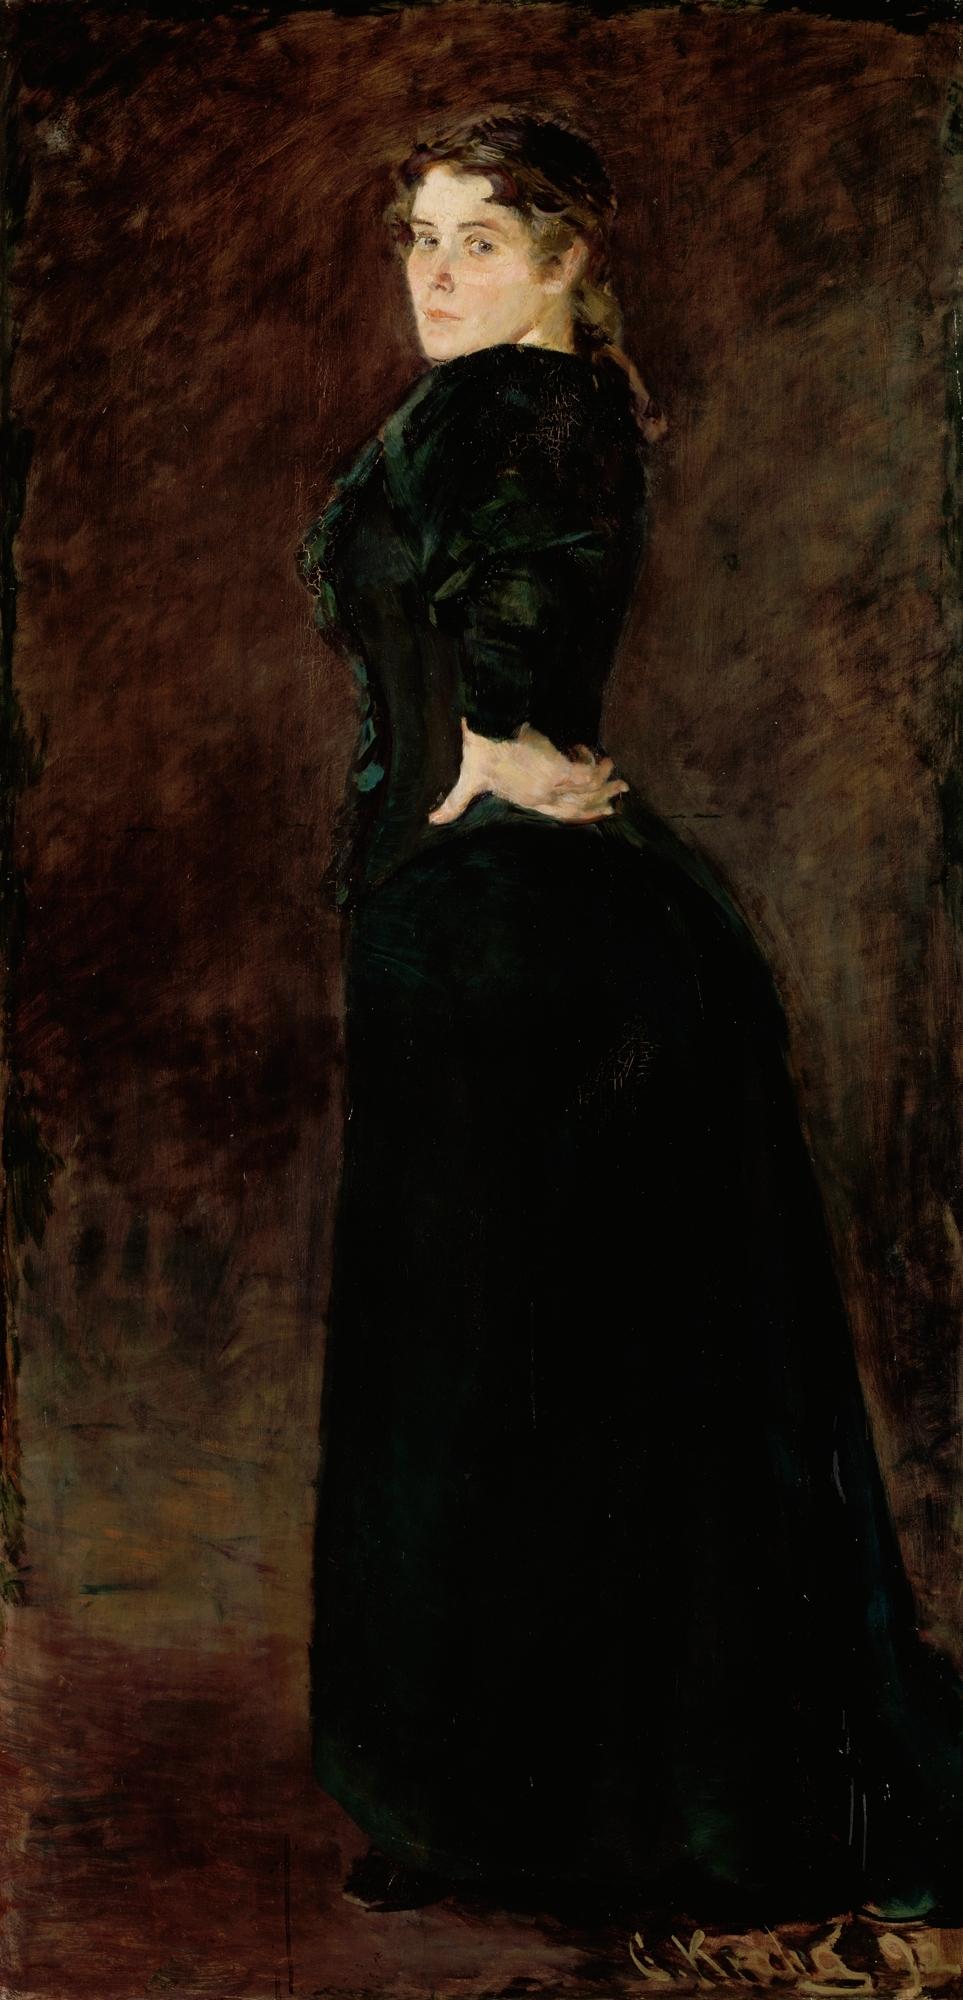 Christian Krohg - Fru Alexandra Thaulow,  f. Lasson. 1892